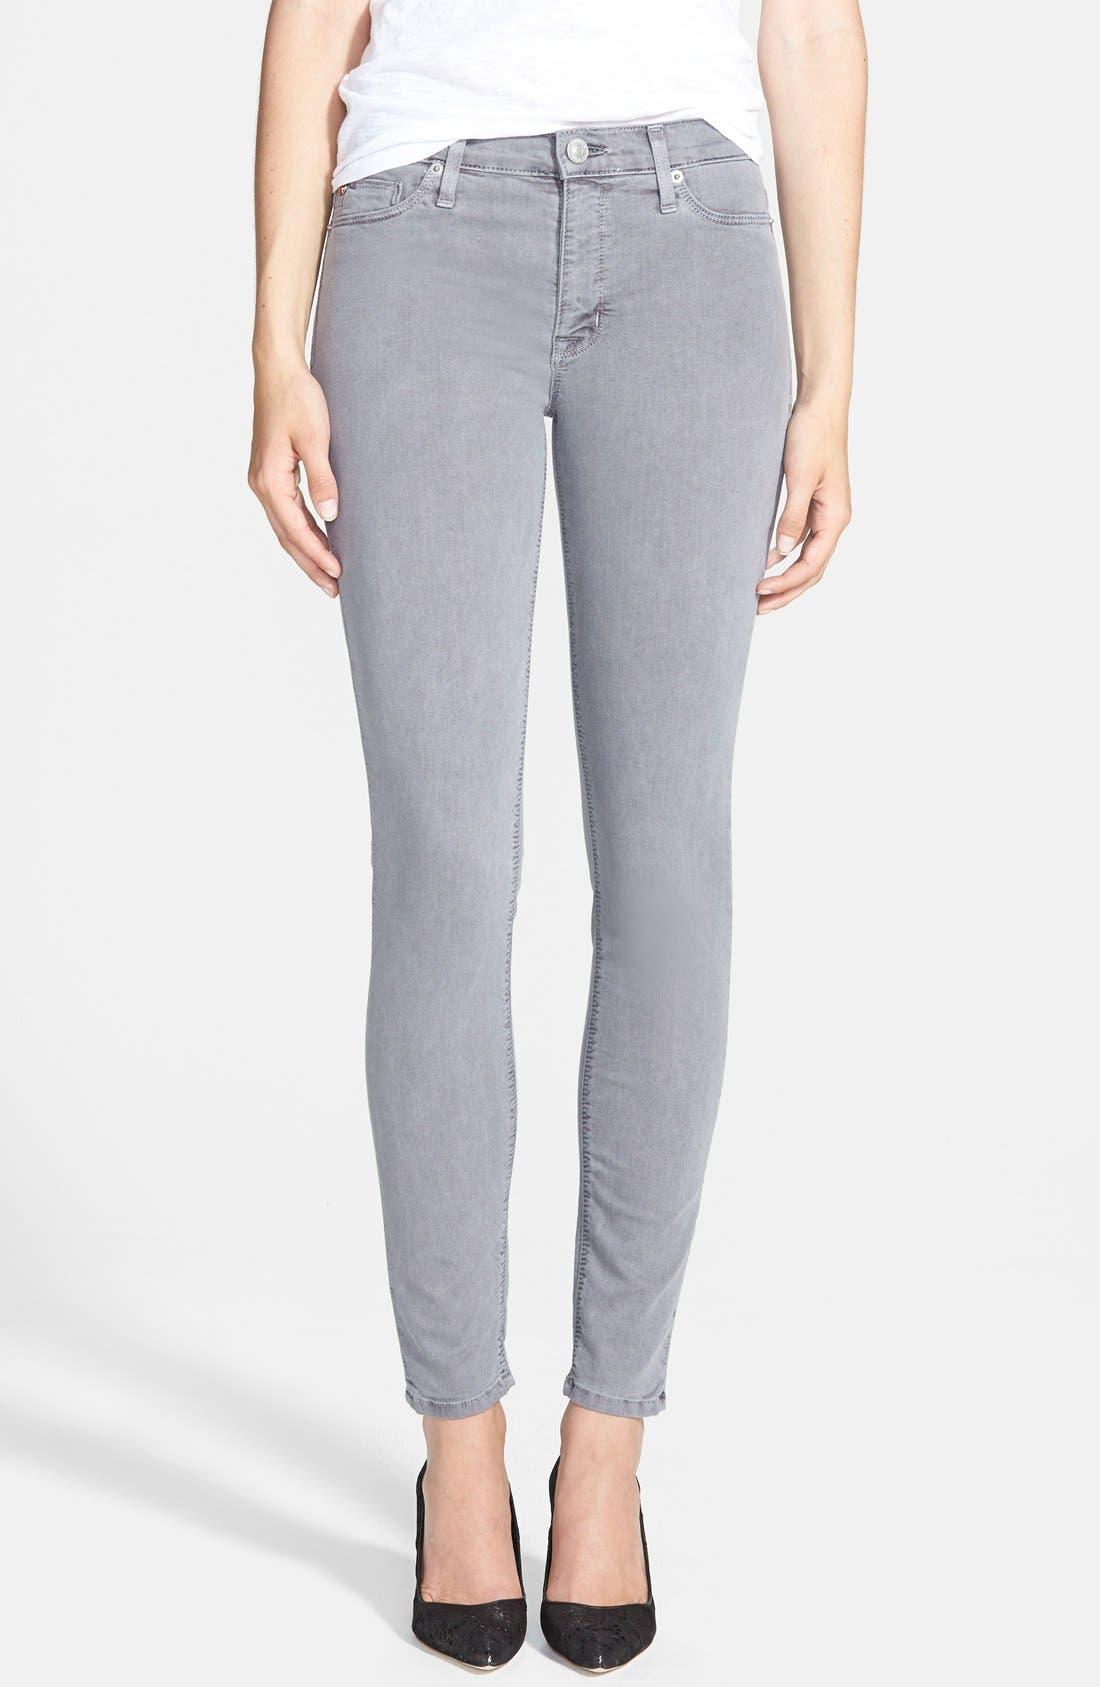 Main Image - Hudson Jeans 'Nico' Skinny Overdyed Jeans (Grey Wash)